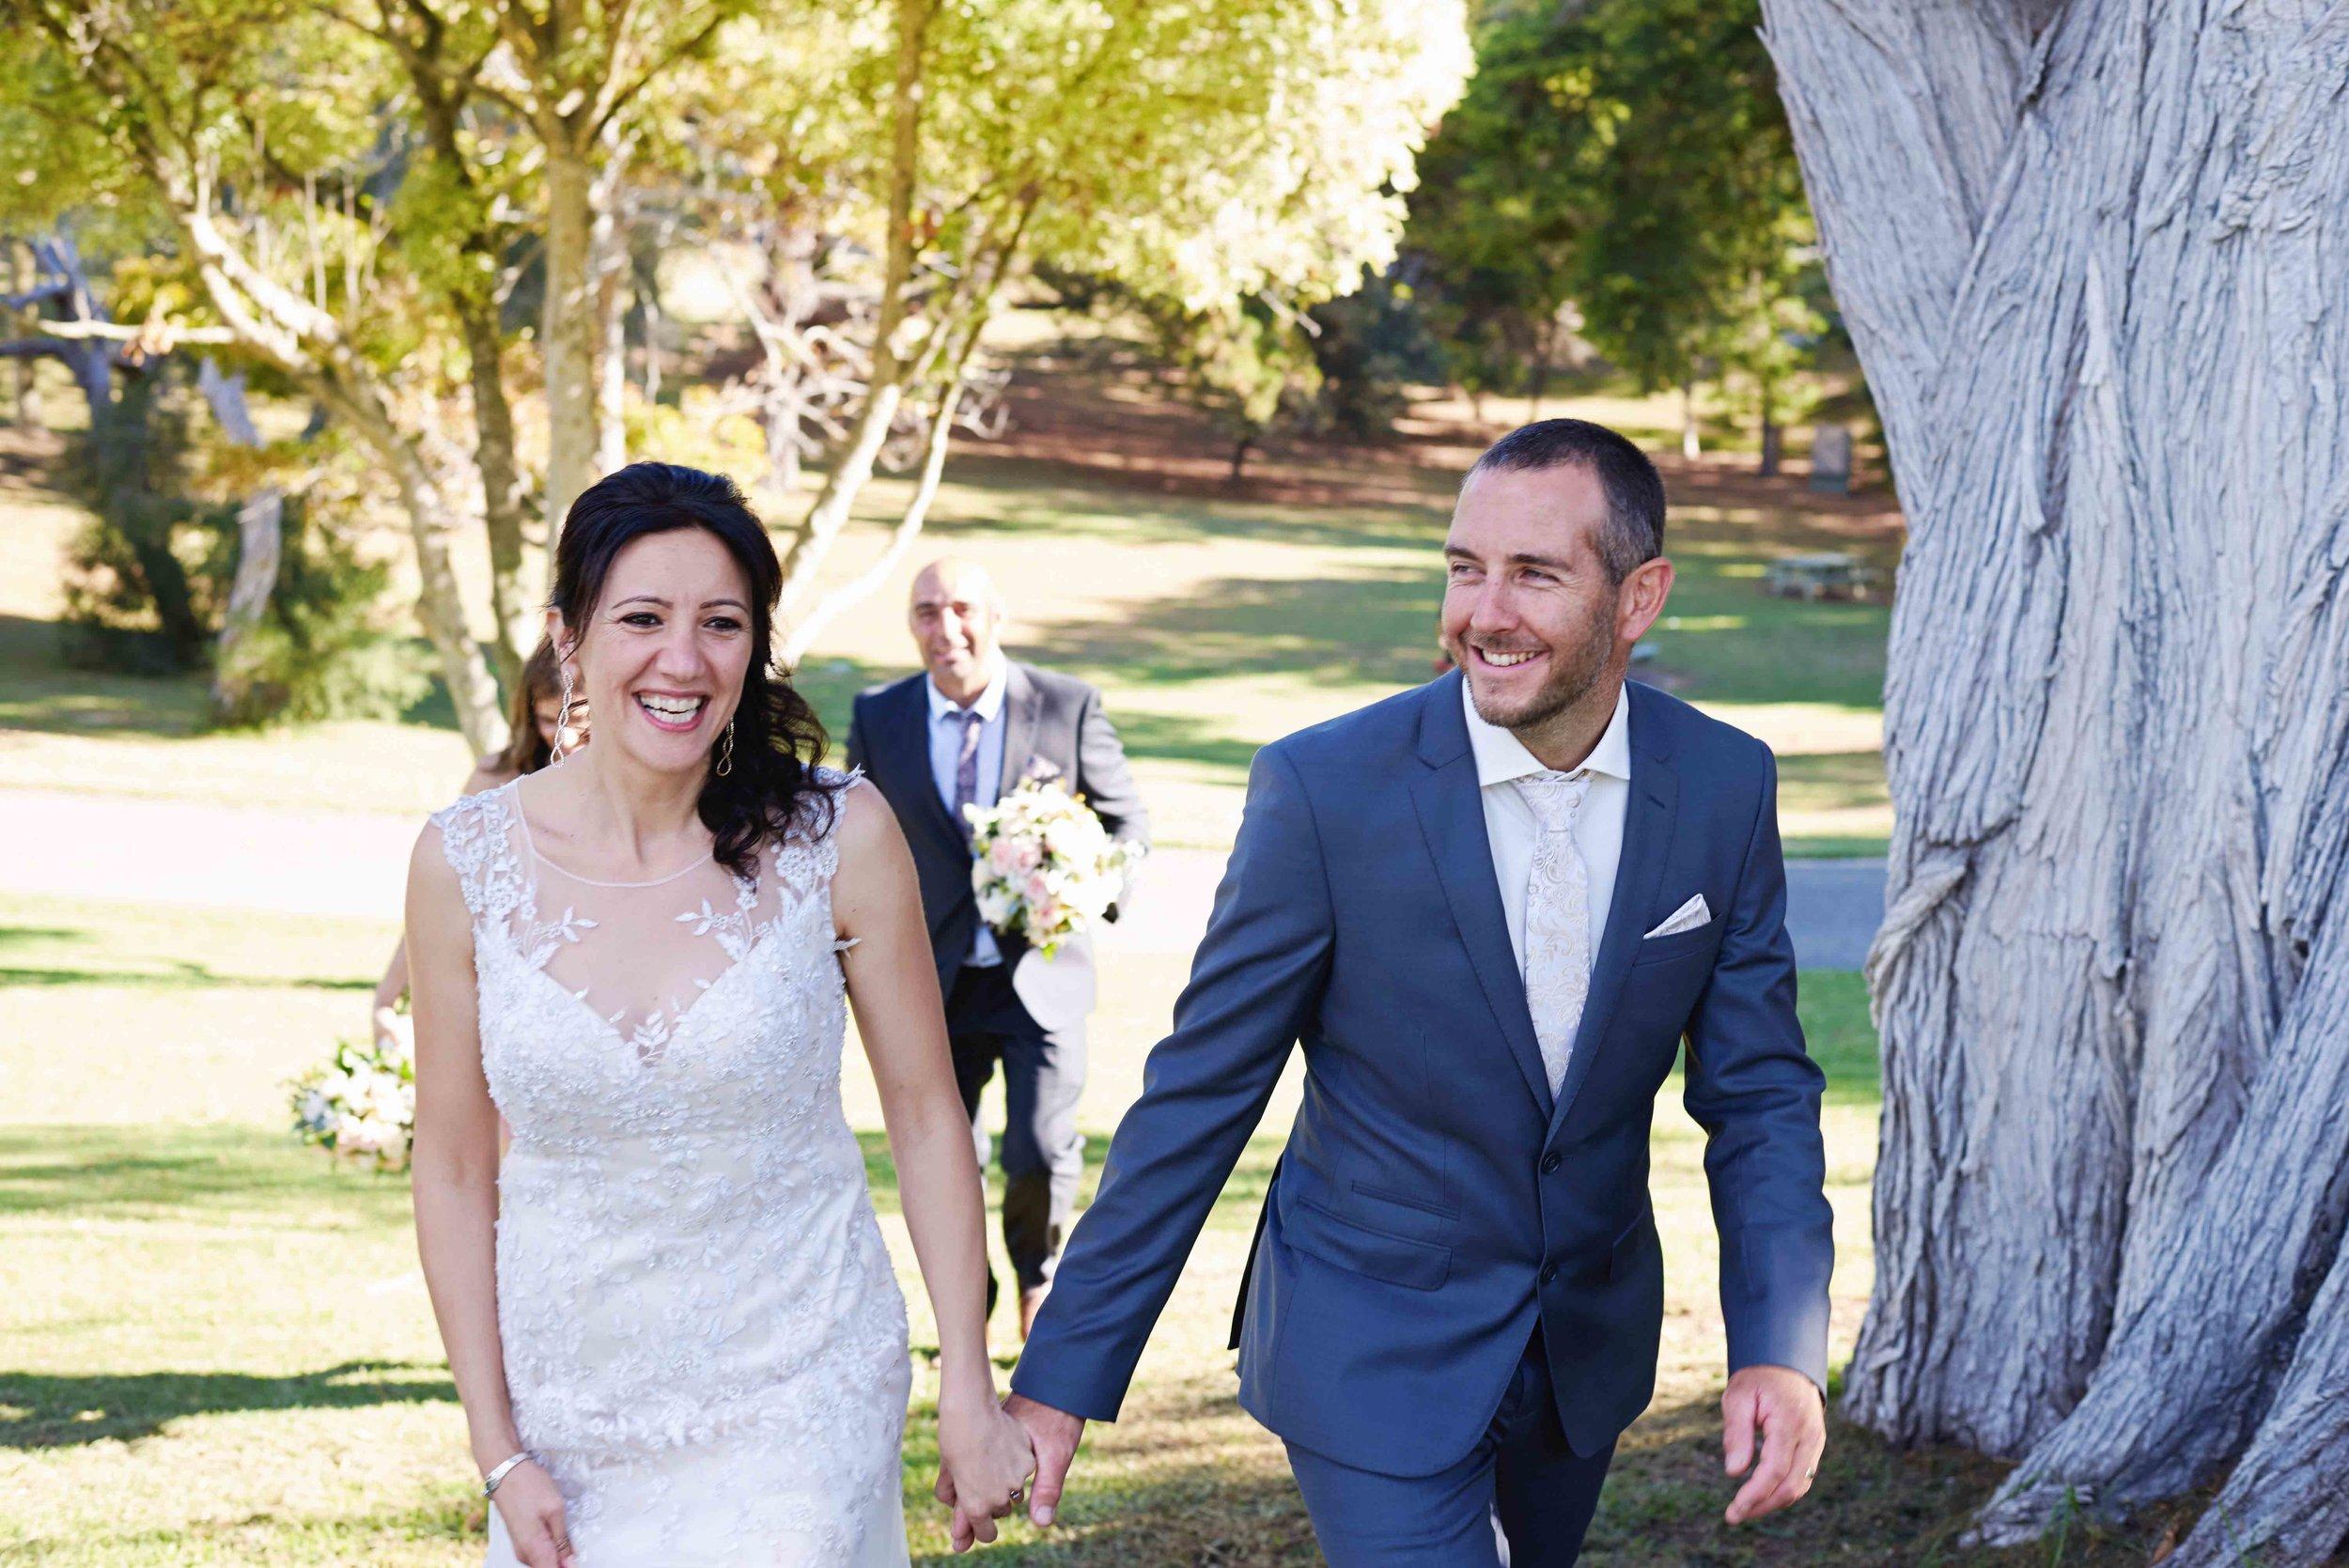 sorrento-wedding-photography-all-smiles-marissa-jade-photography-150.jpg